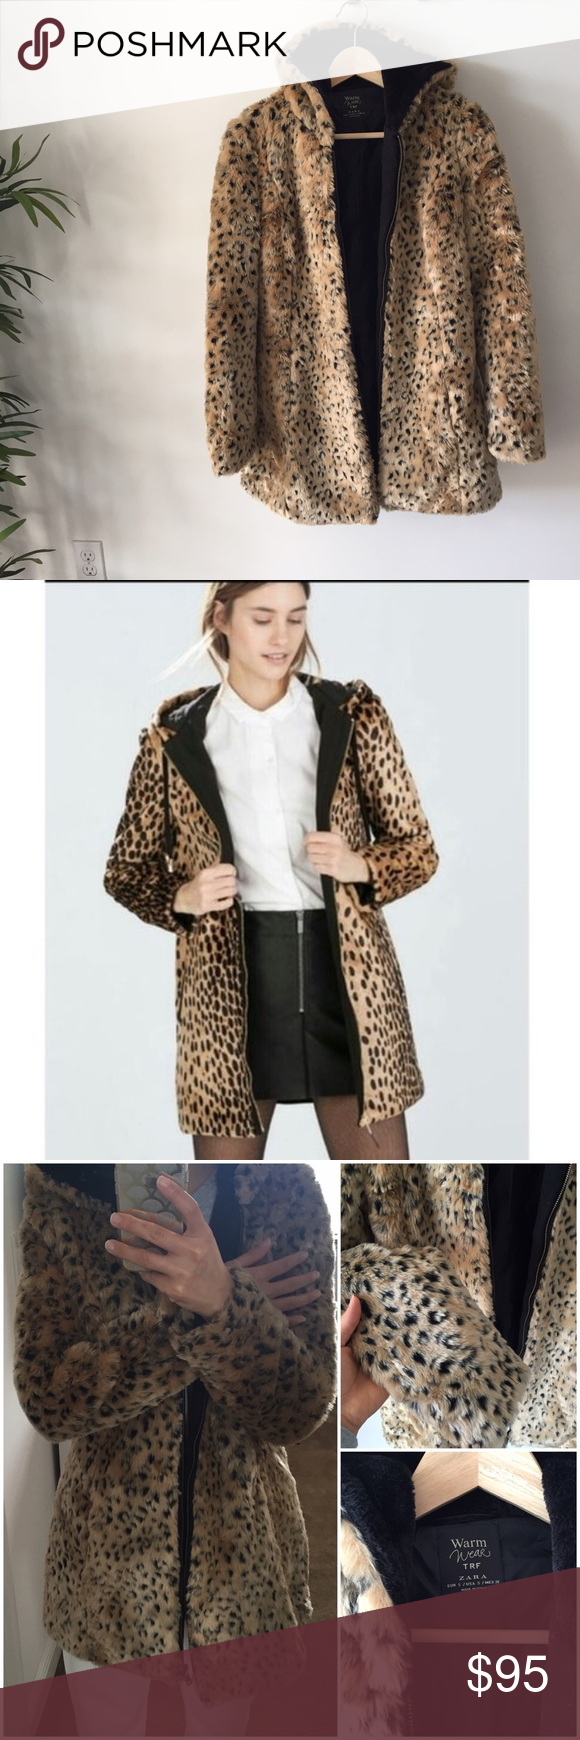 Zara Faux Leopard Print Coat With Hood Size S Leopard Print Coat Clothes Design Zara [ 1740 x 580 Pixel ]